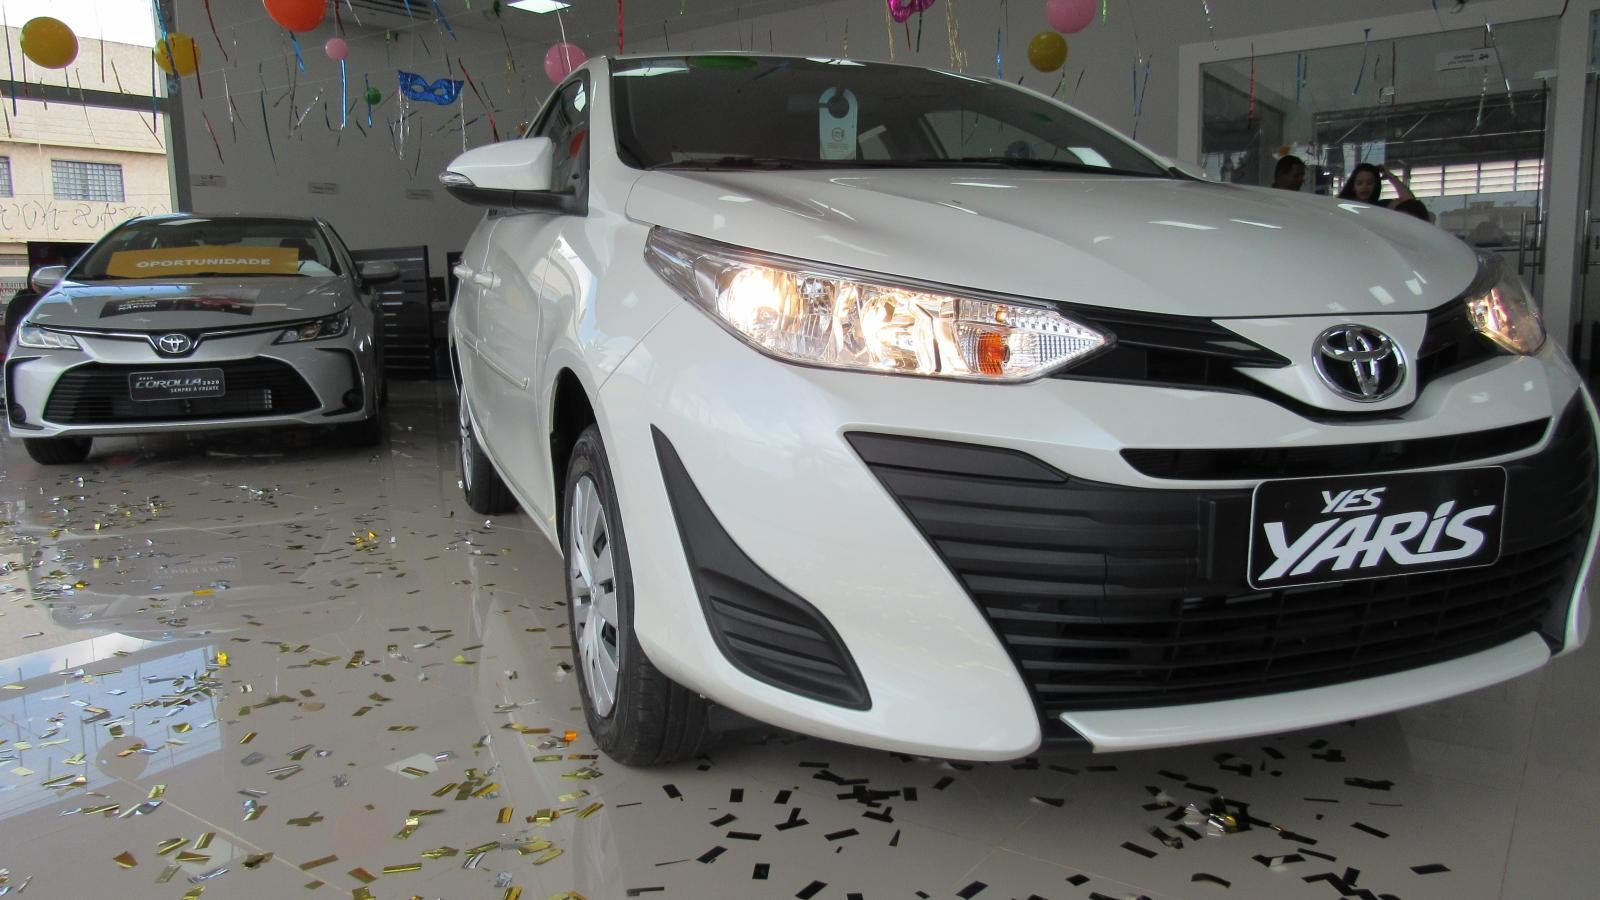 //www.autoline.com.br/carro/toyota/yaris-15-xls-connect-16v-flex-4p-automatico/2021/brasilia-df/12314095